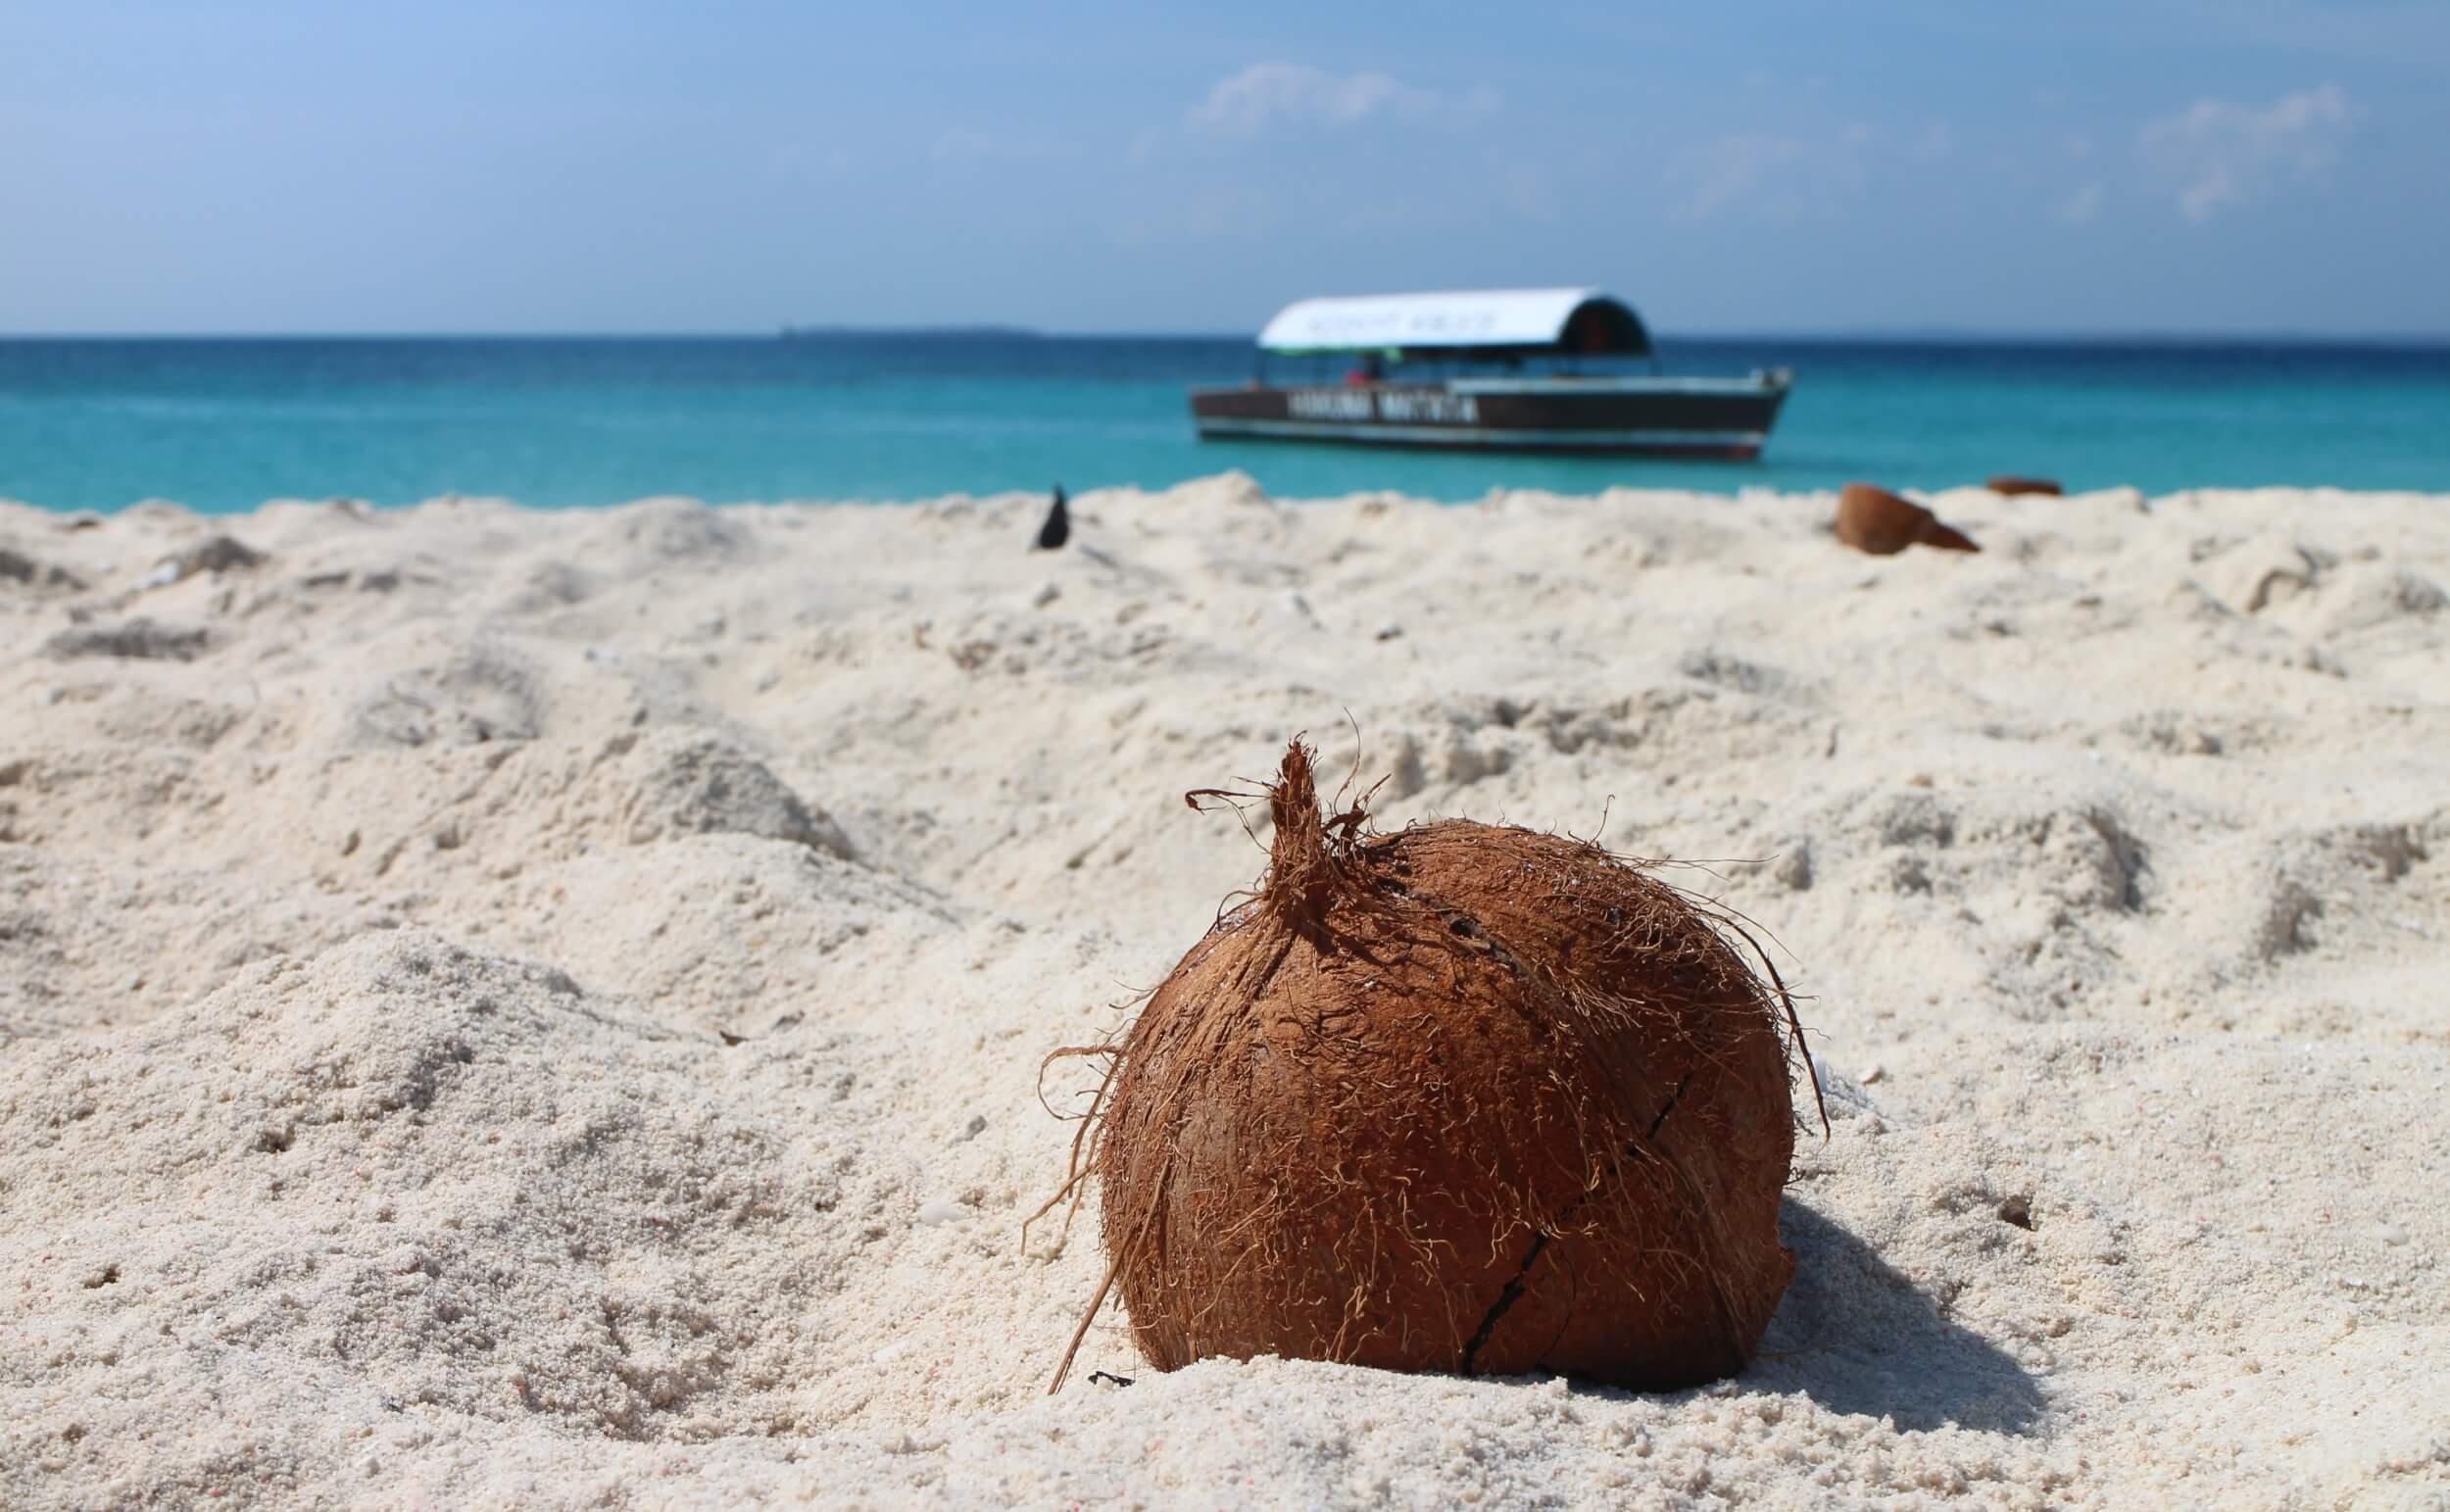 Urlaub am Sandstrand (c) koseb / pixabay.de